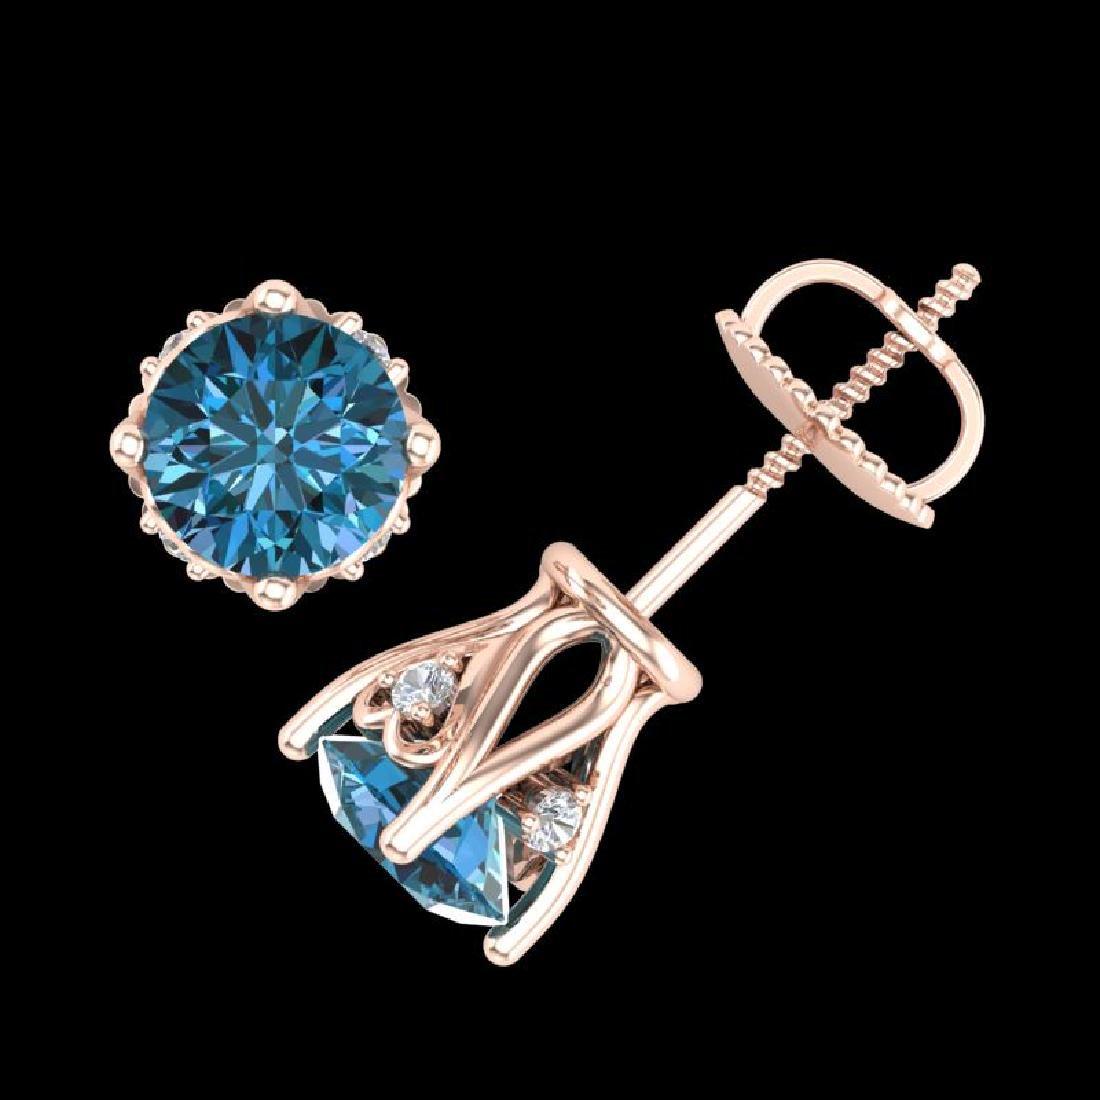 1.26 CTW Fancy Intense Blue Diamond Art Deco Stud - 3